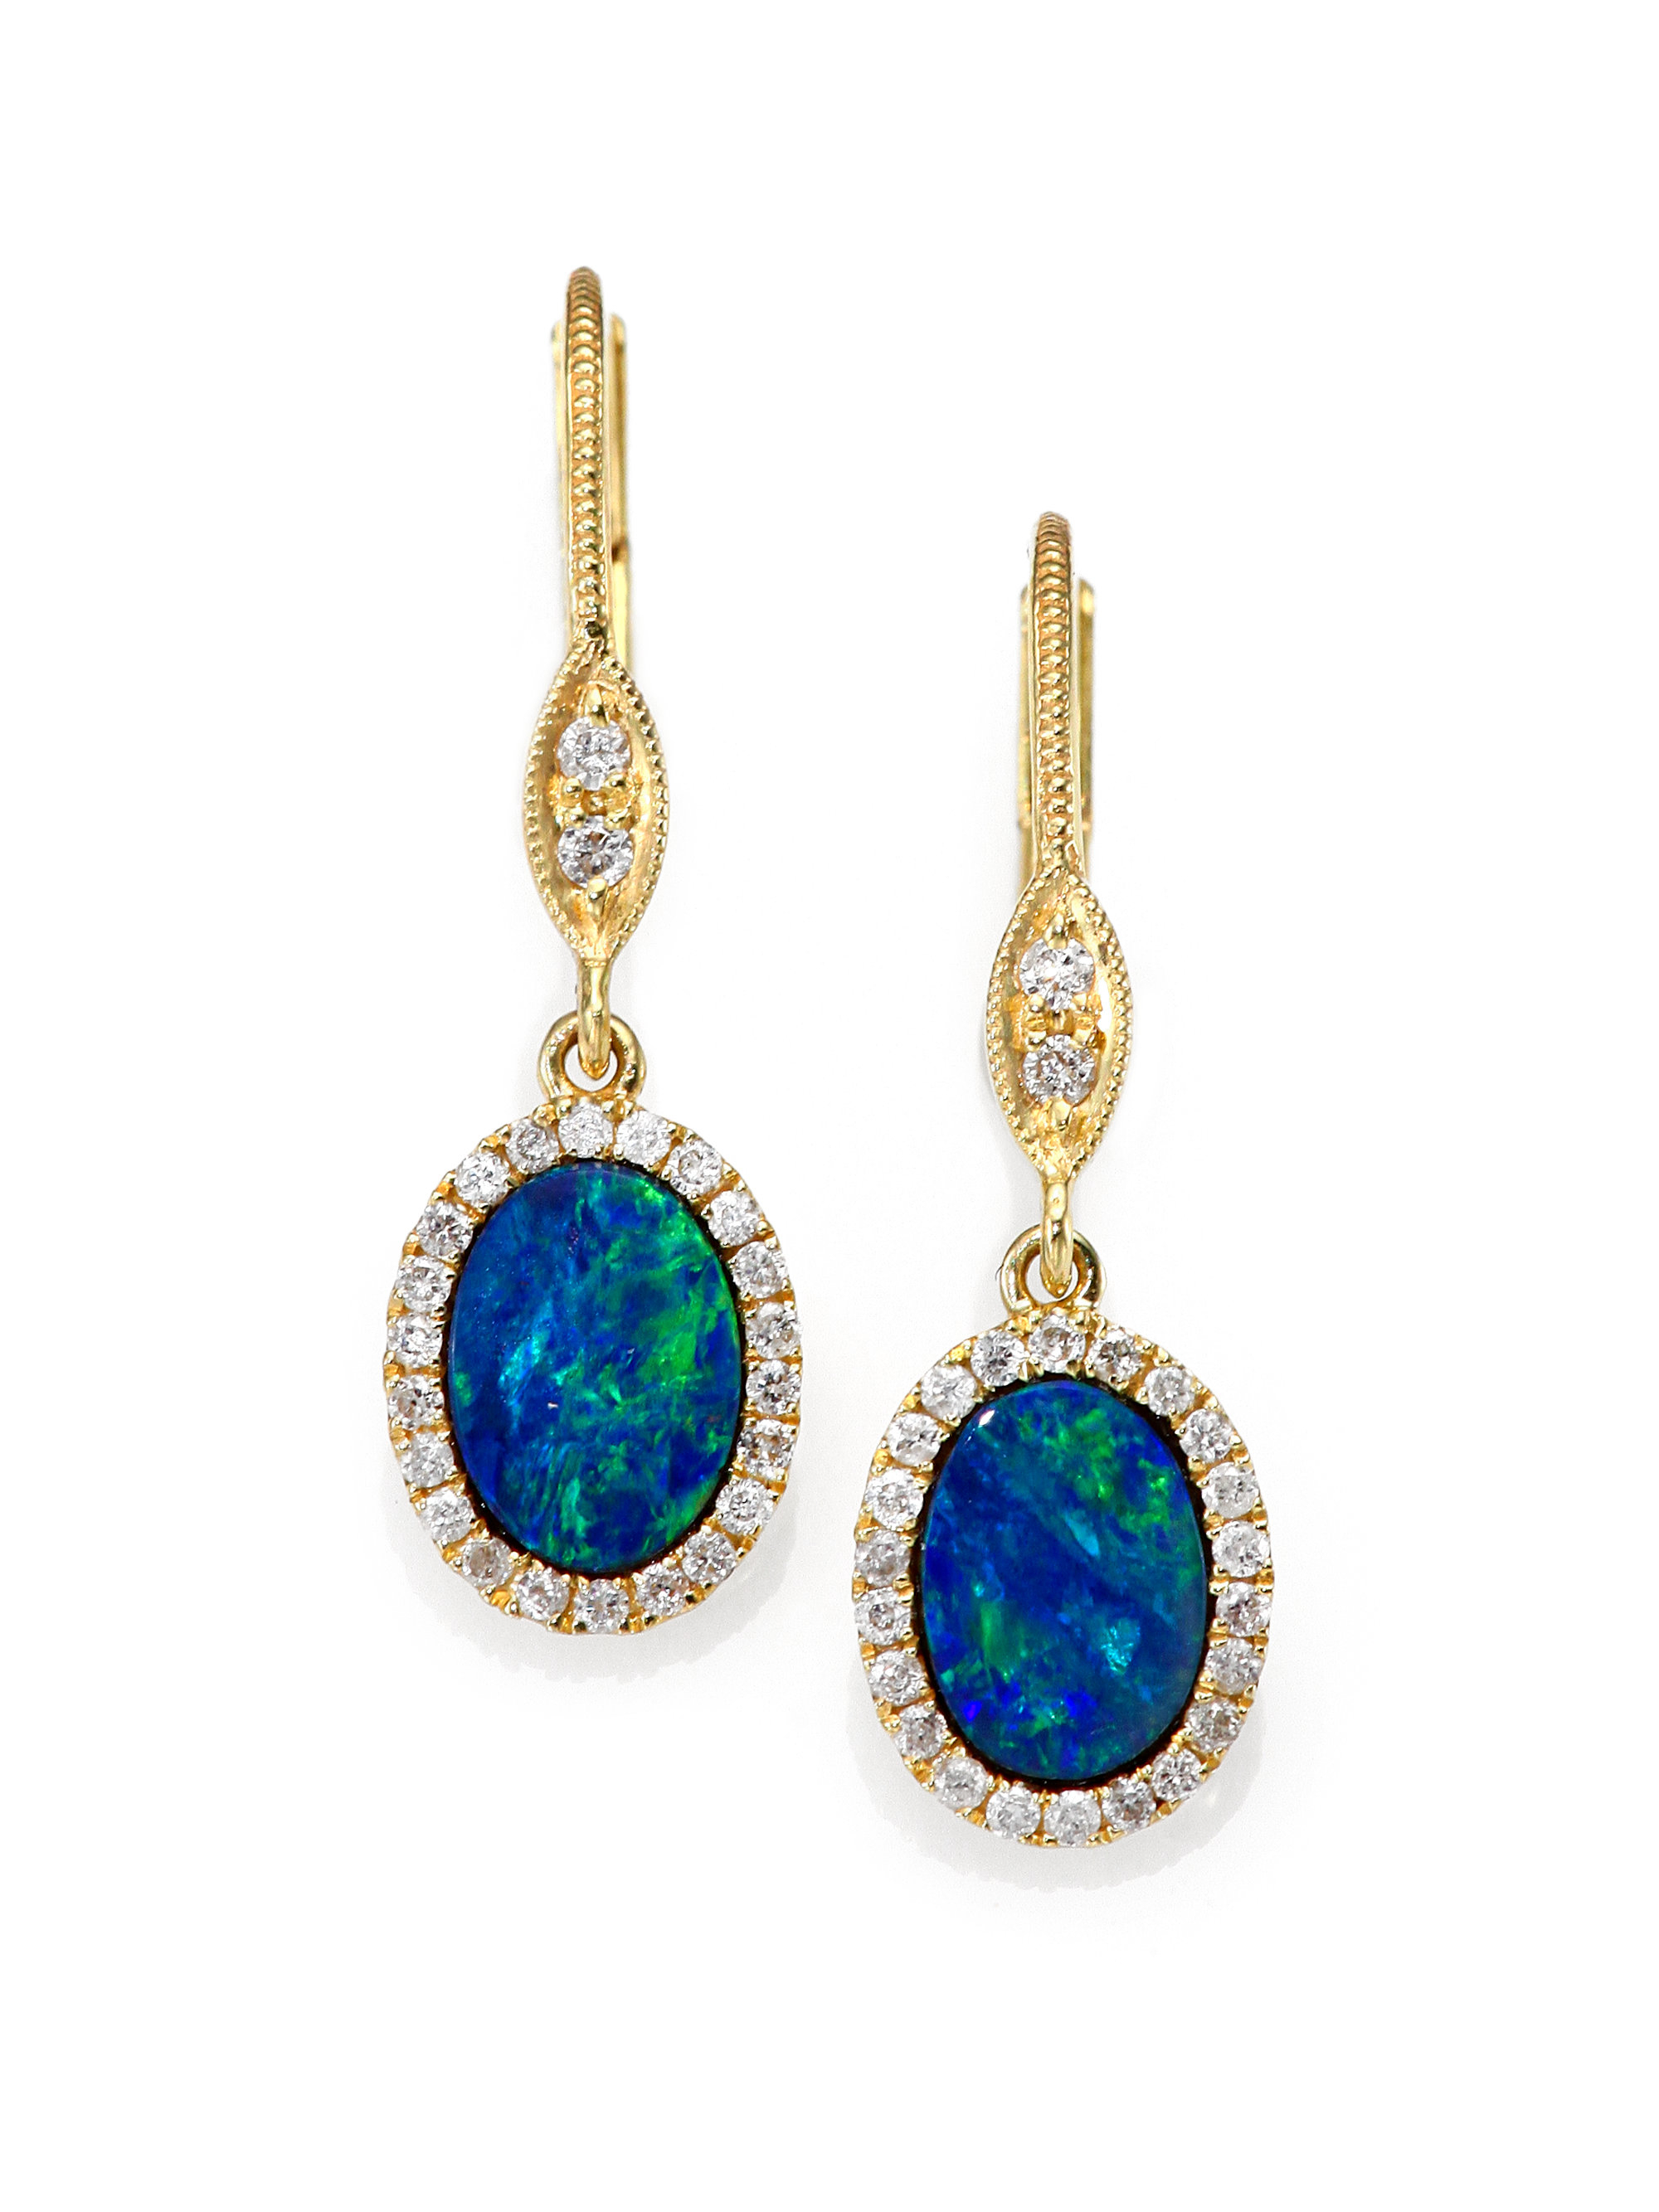 meira t blue opal diamond 14k yellow gold drop earrings. Black Bedroom Furniture Sets. Home Design Ideas